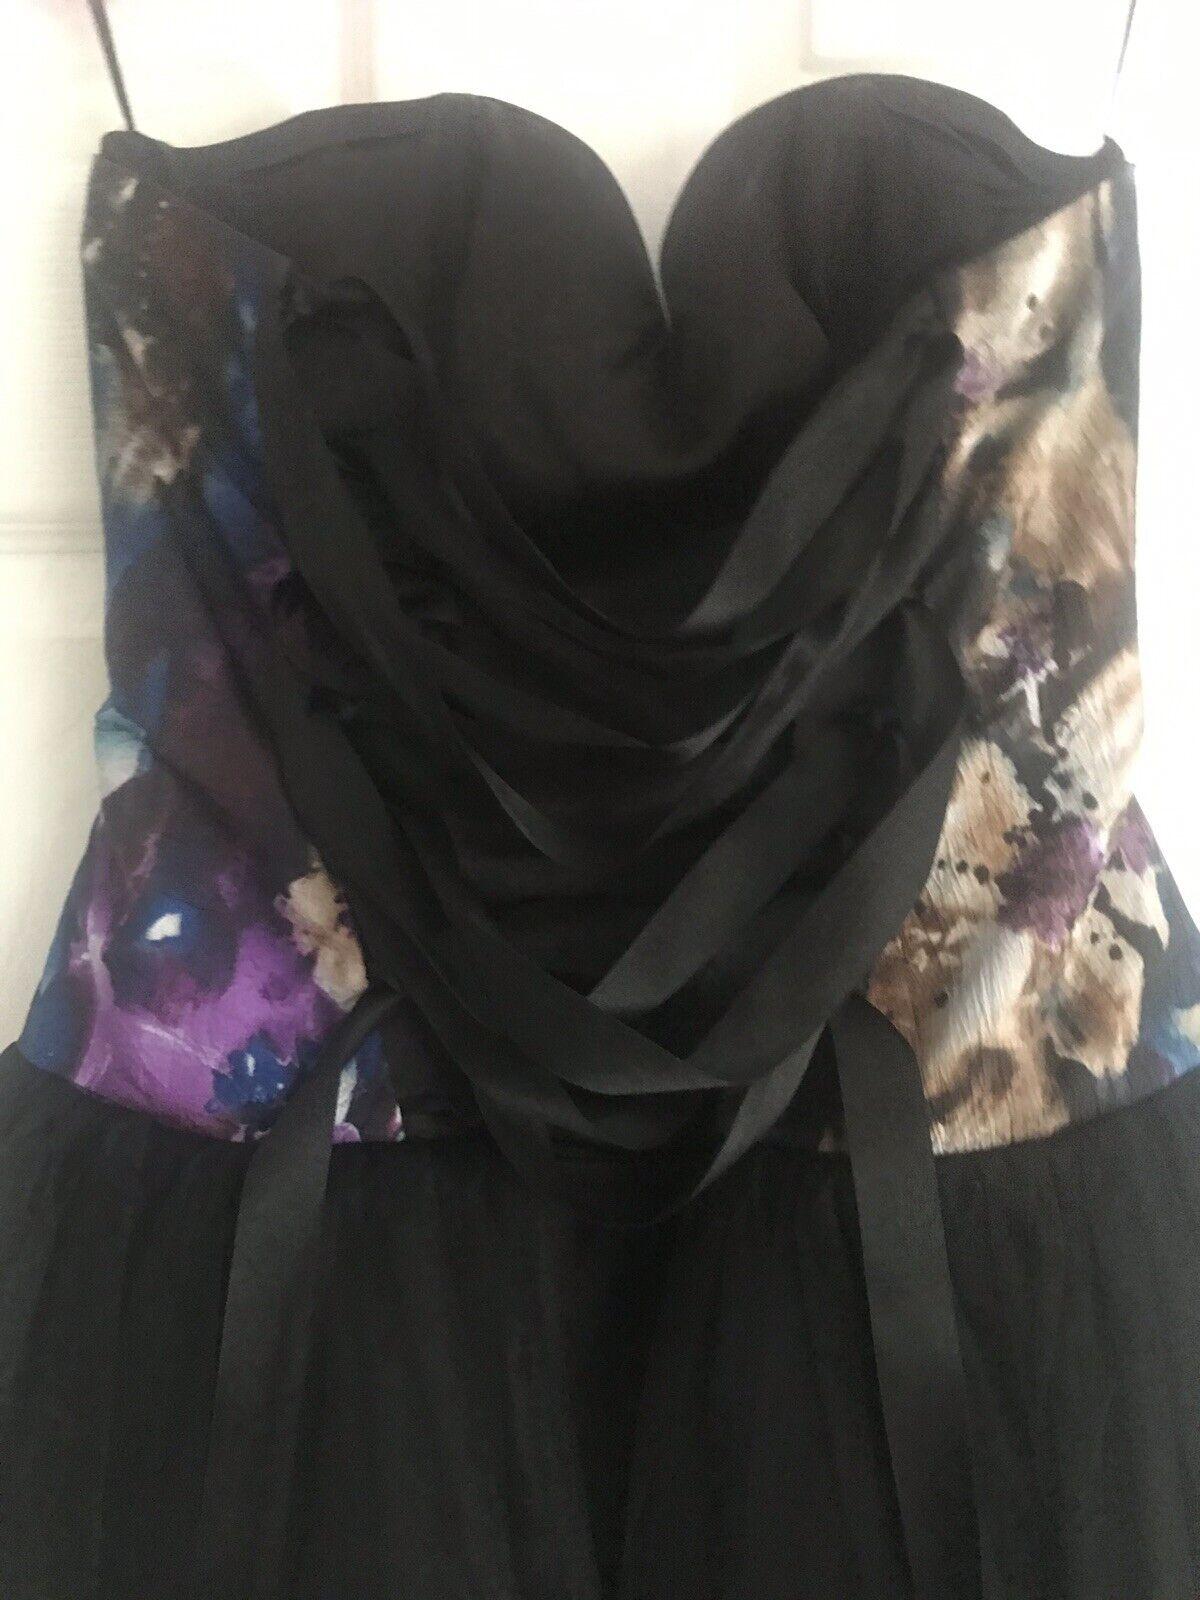 schwarz w lila Blau Blau Blau Floral Strapless Boned Bodice Fishtail Net Party Prom Dress 5d2cf6